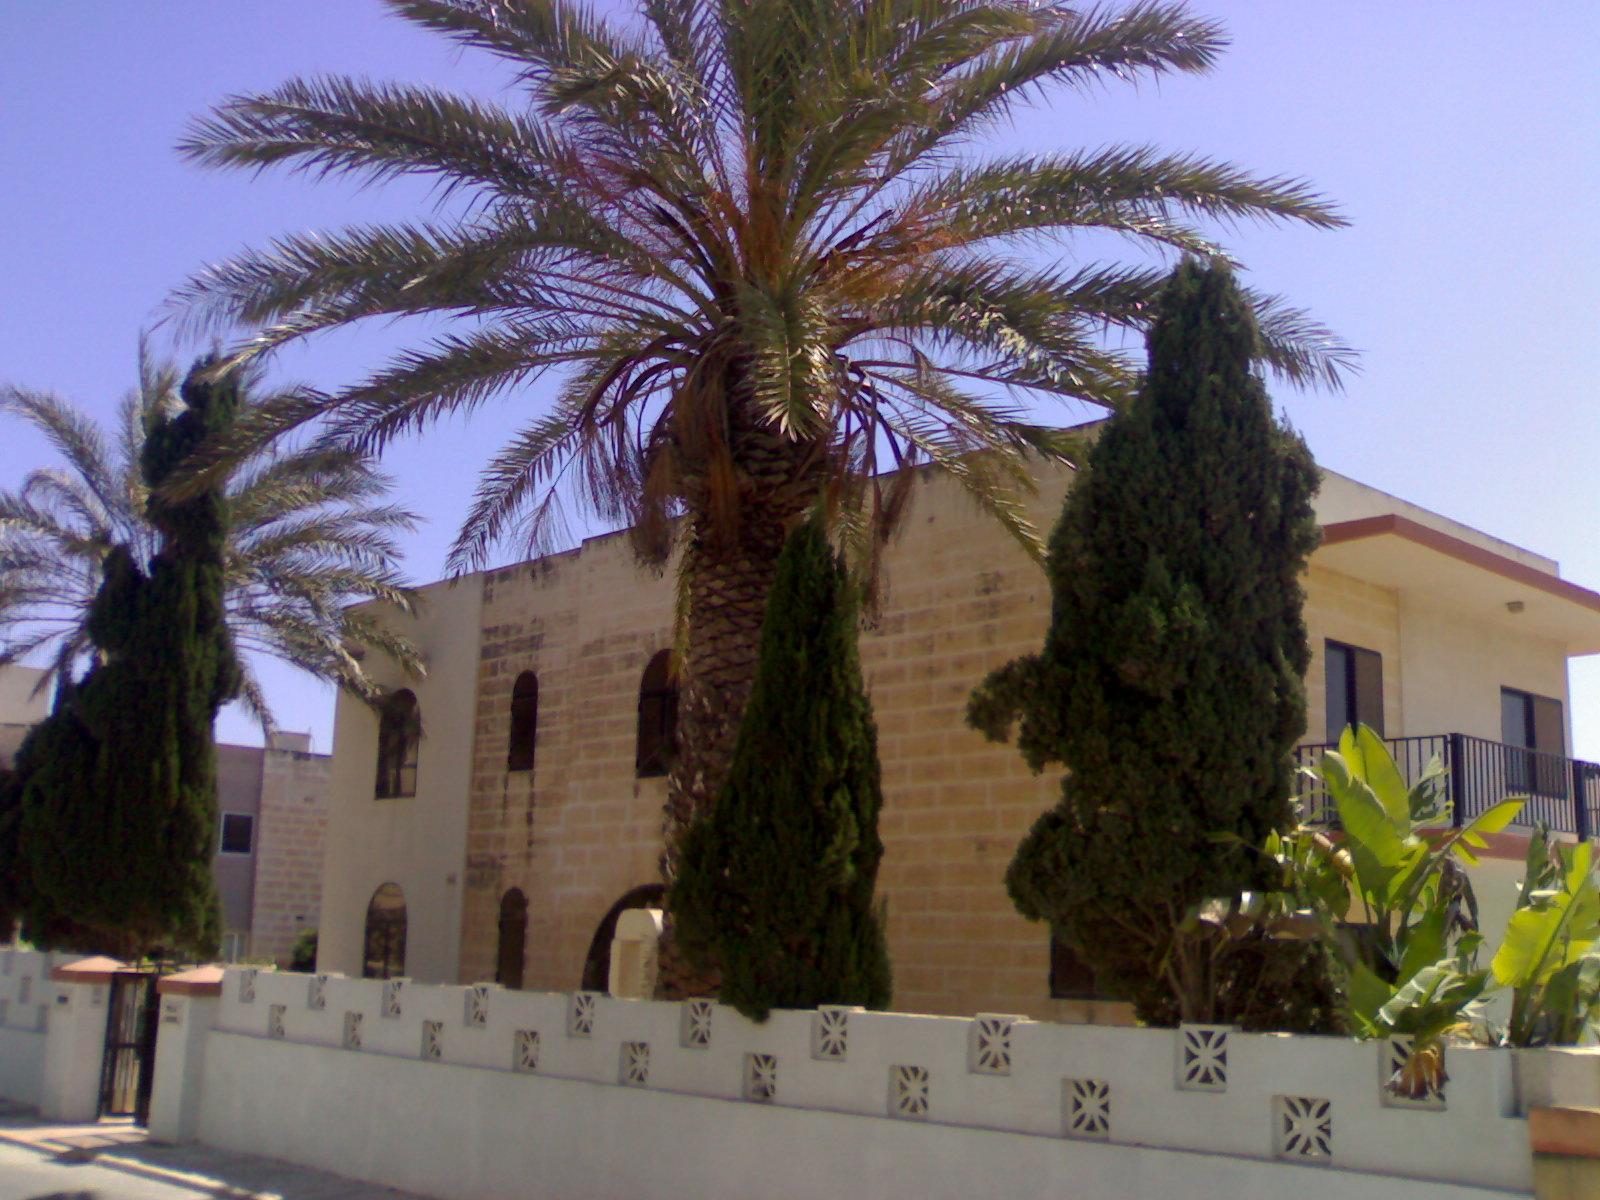 Villa mit Palmen